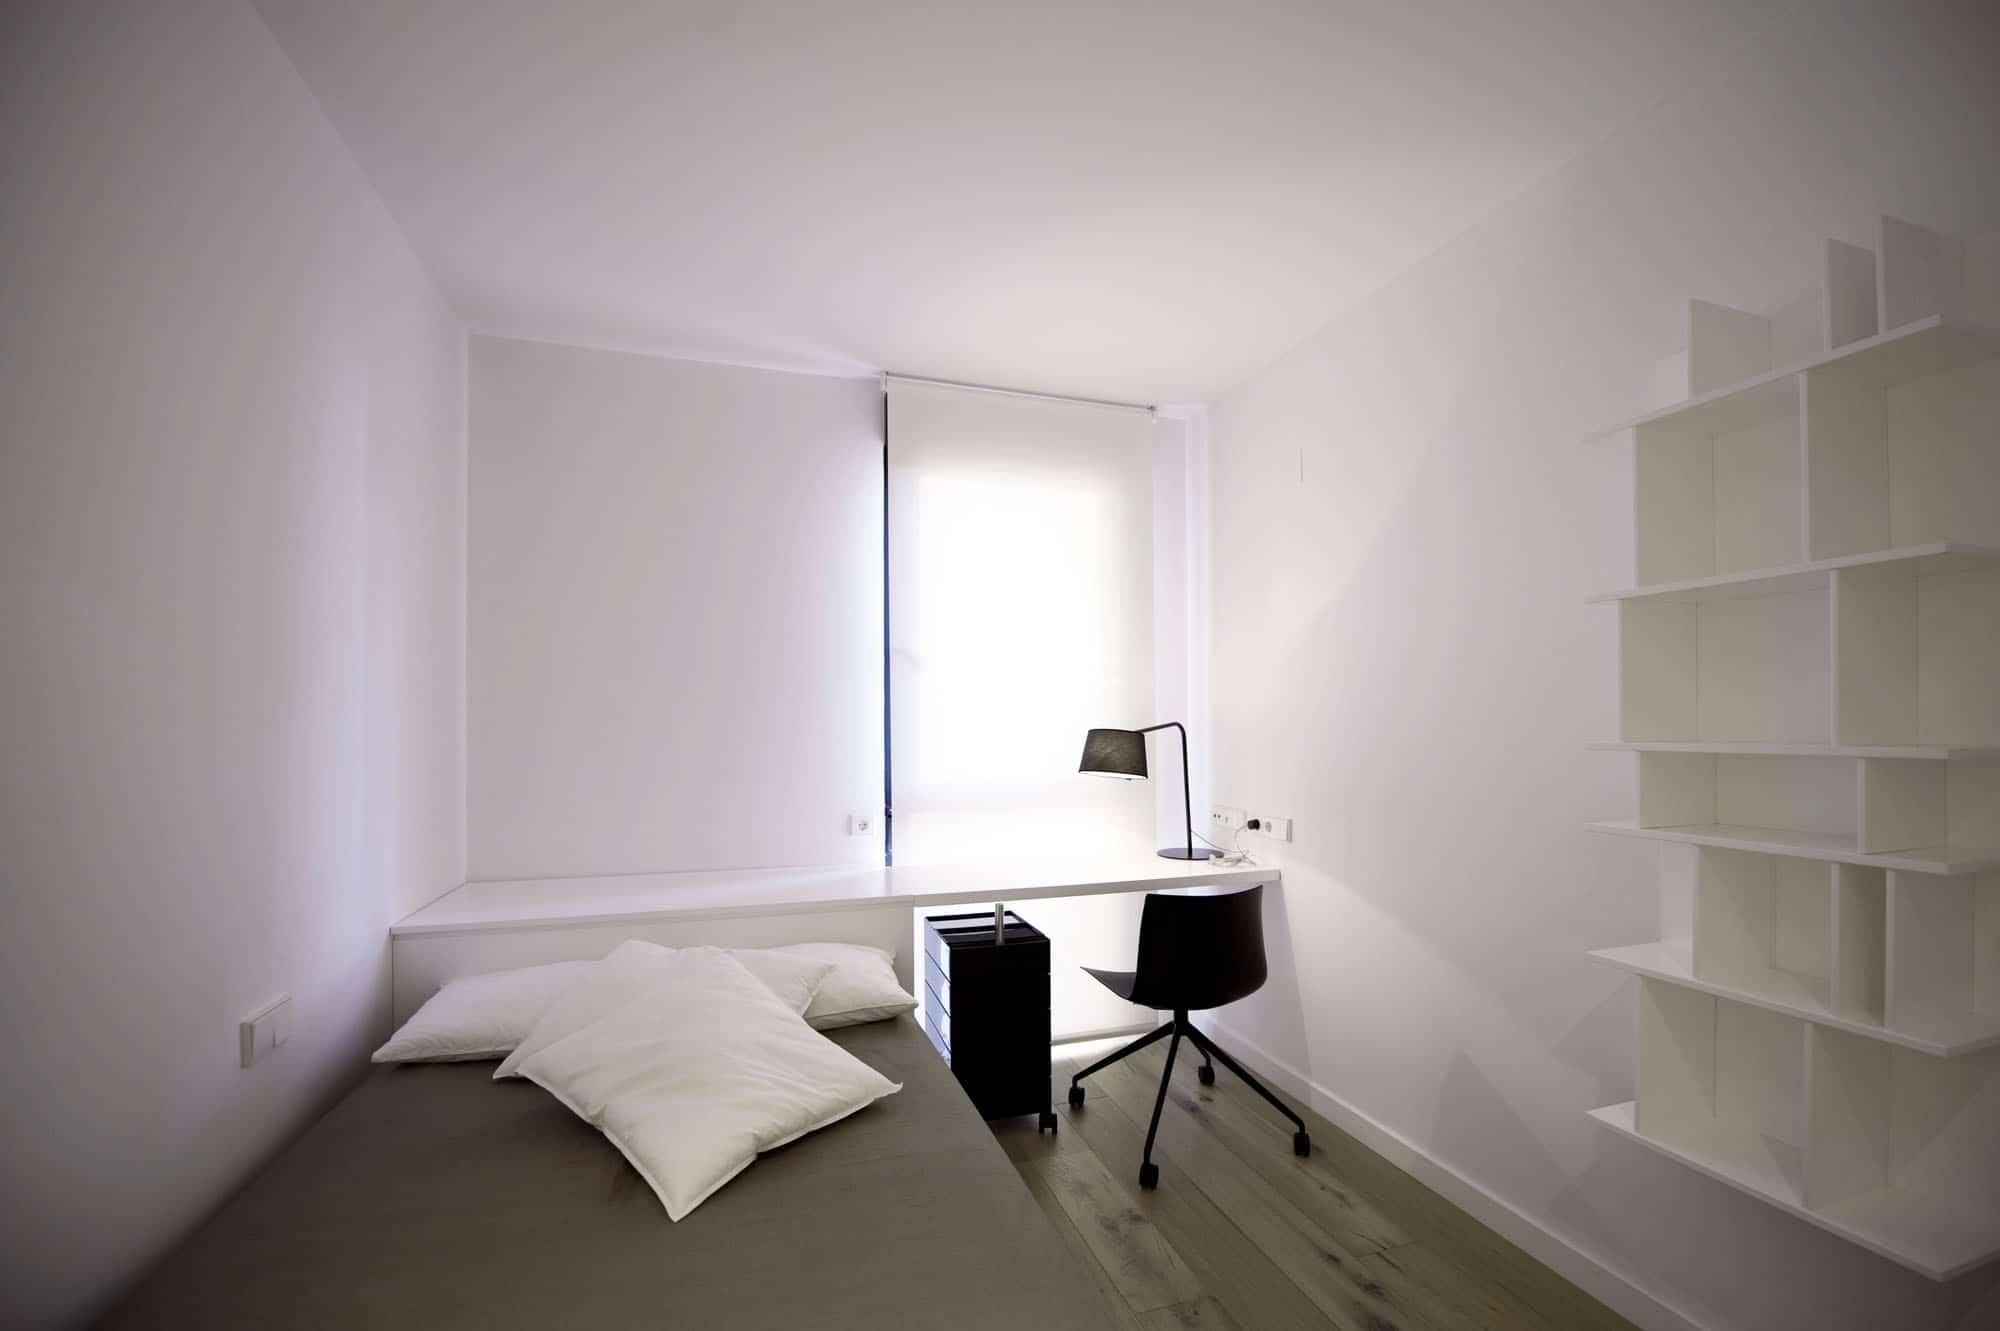 HI-MACS Doble Dueto Apartment by Cuartopensante